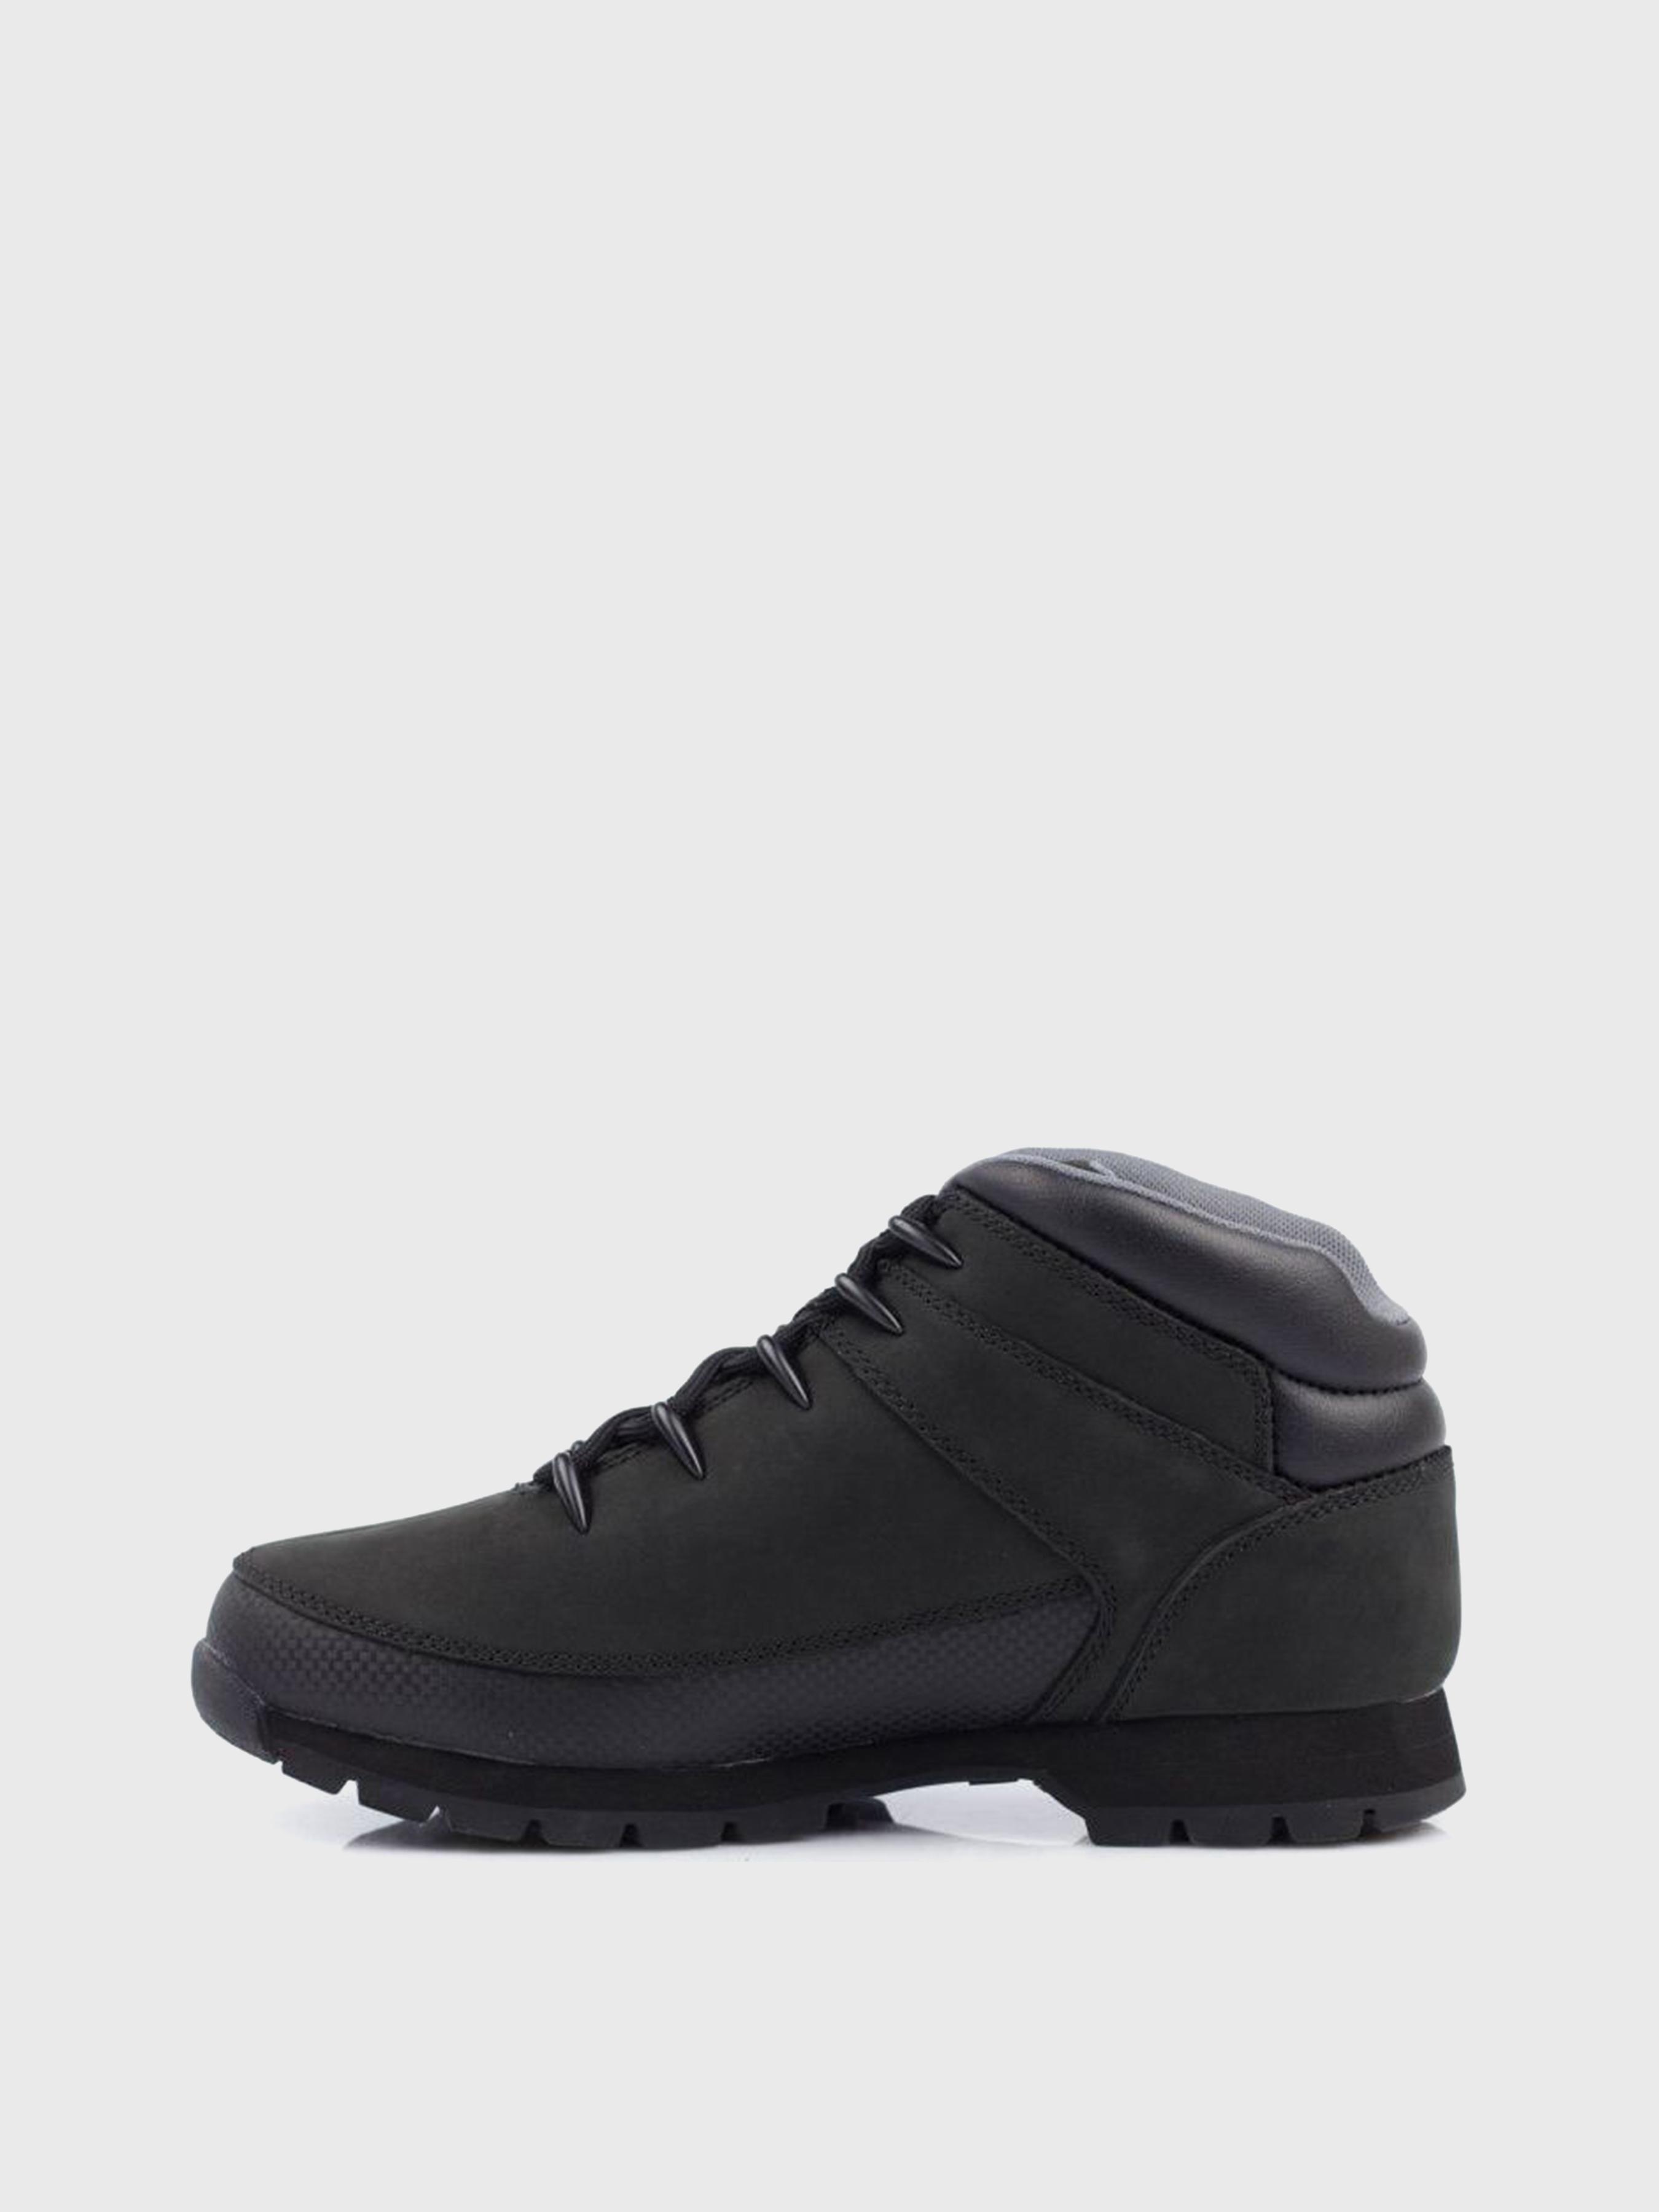 Ботинки для мужчин Timberland Euro Sprint Hiker TF3315 модная обувь, 2017